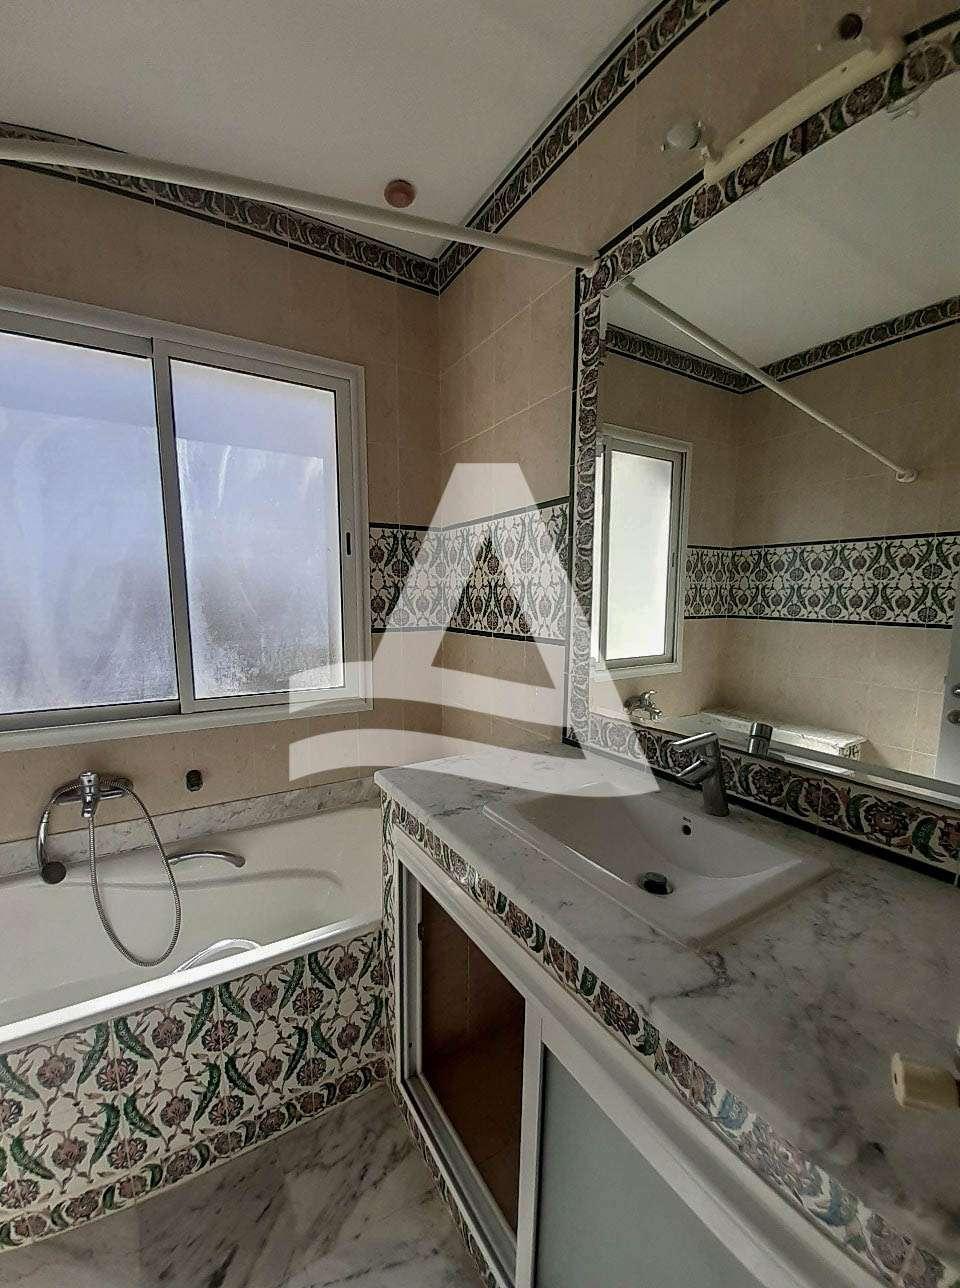 httpss3.amazonaws.comlogimoaws13373164681617896966Appartement_Marsa_Tunisie_-9-1